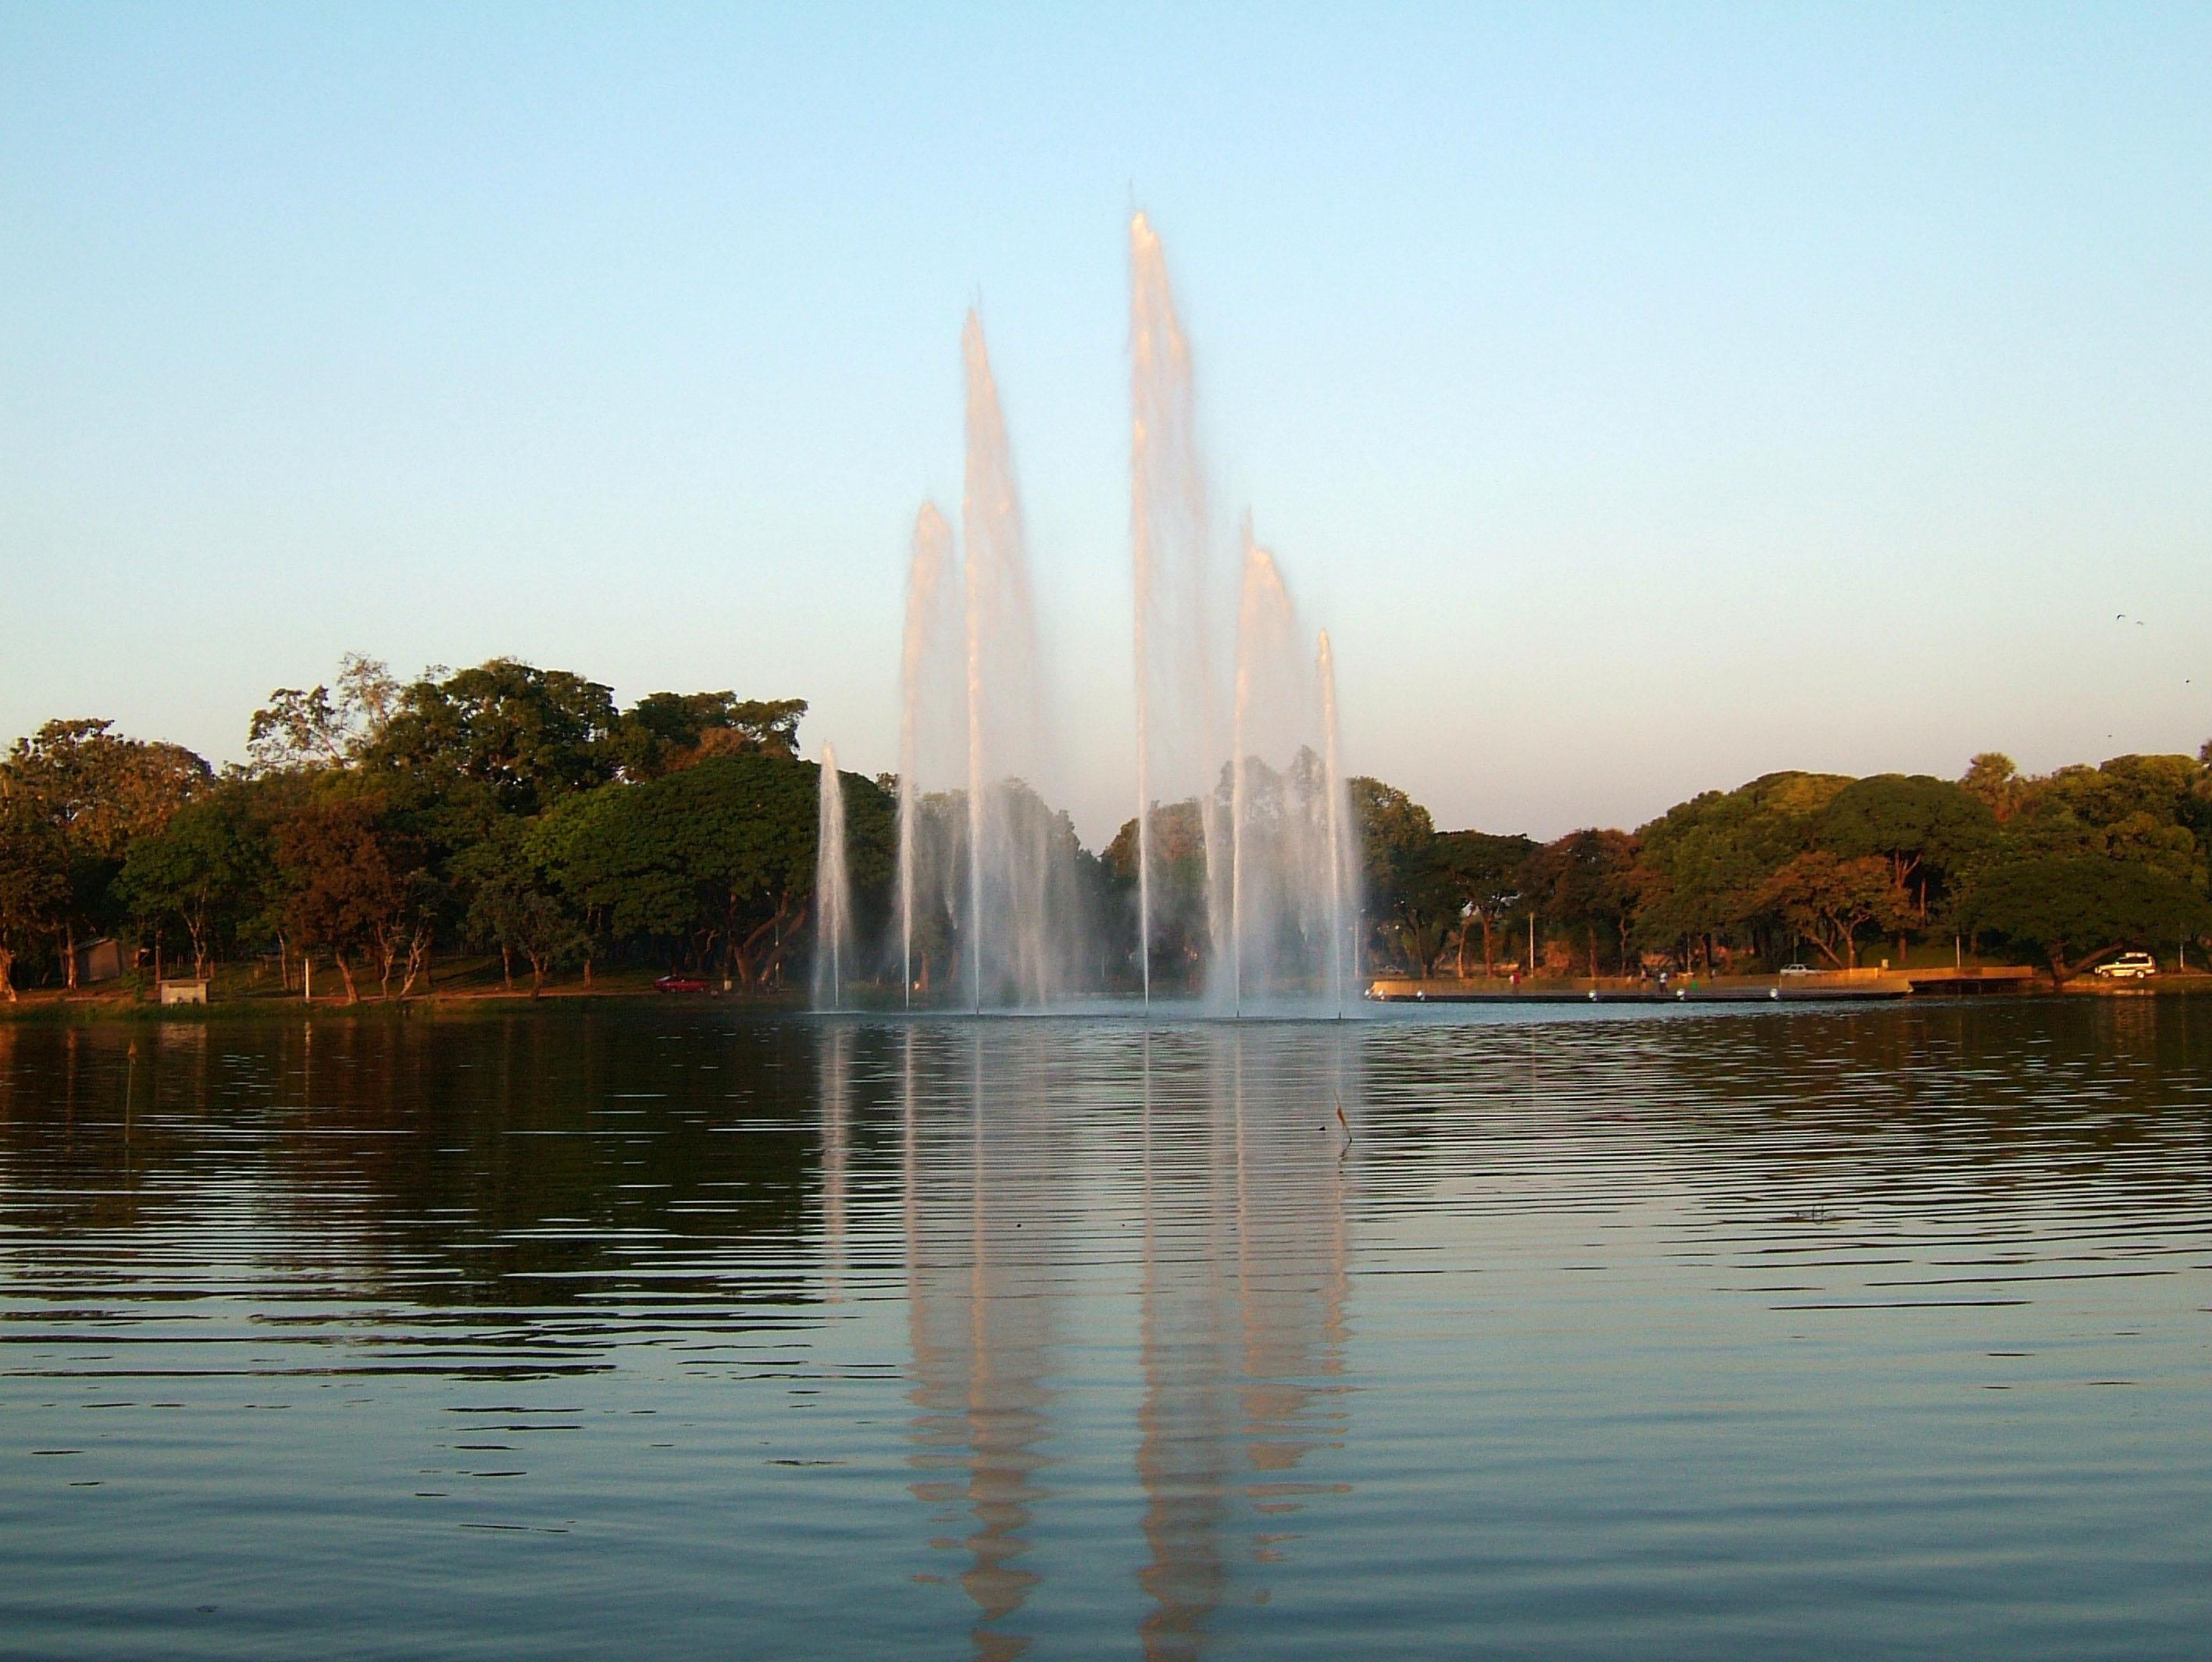 Yangon Kandawgyi Lake fountain panoramic views Nov 2004 02